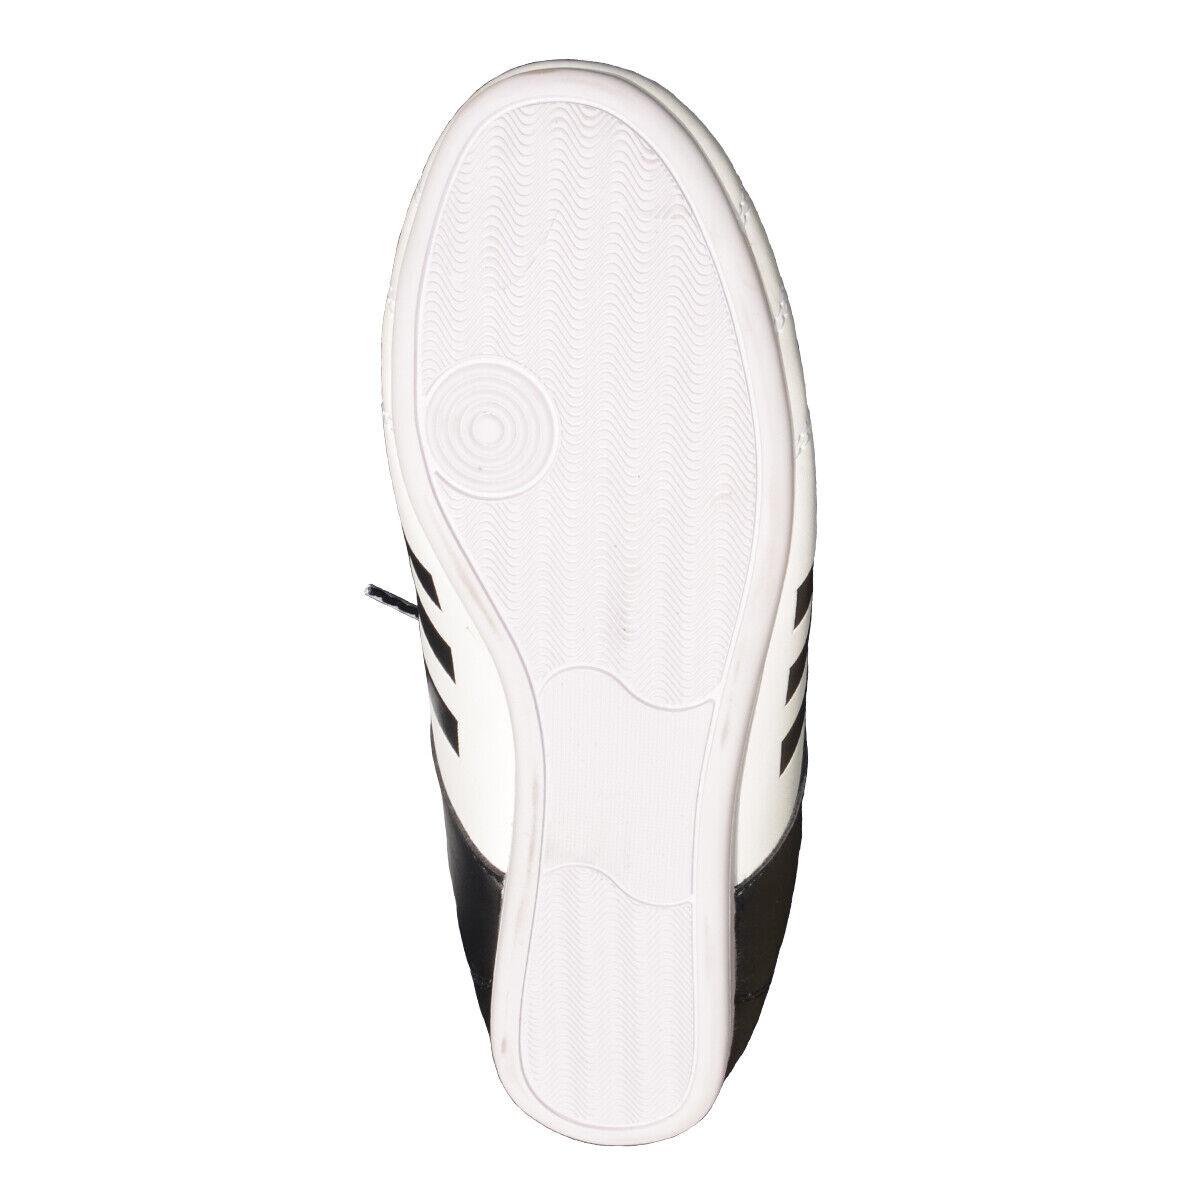 Scarpa da allenamento Modello Adi-Kick II II II bianca Adidas - 30102035N 3bd9c8